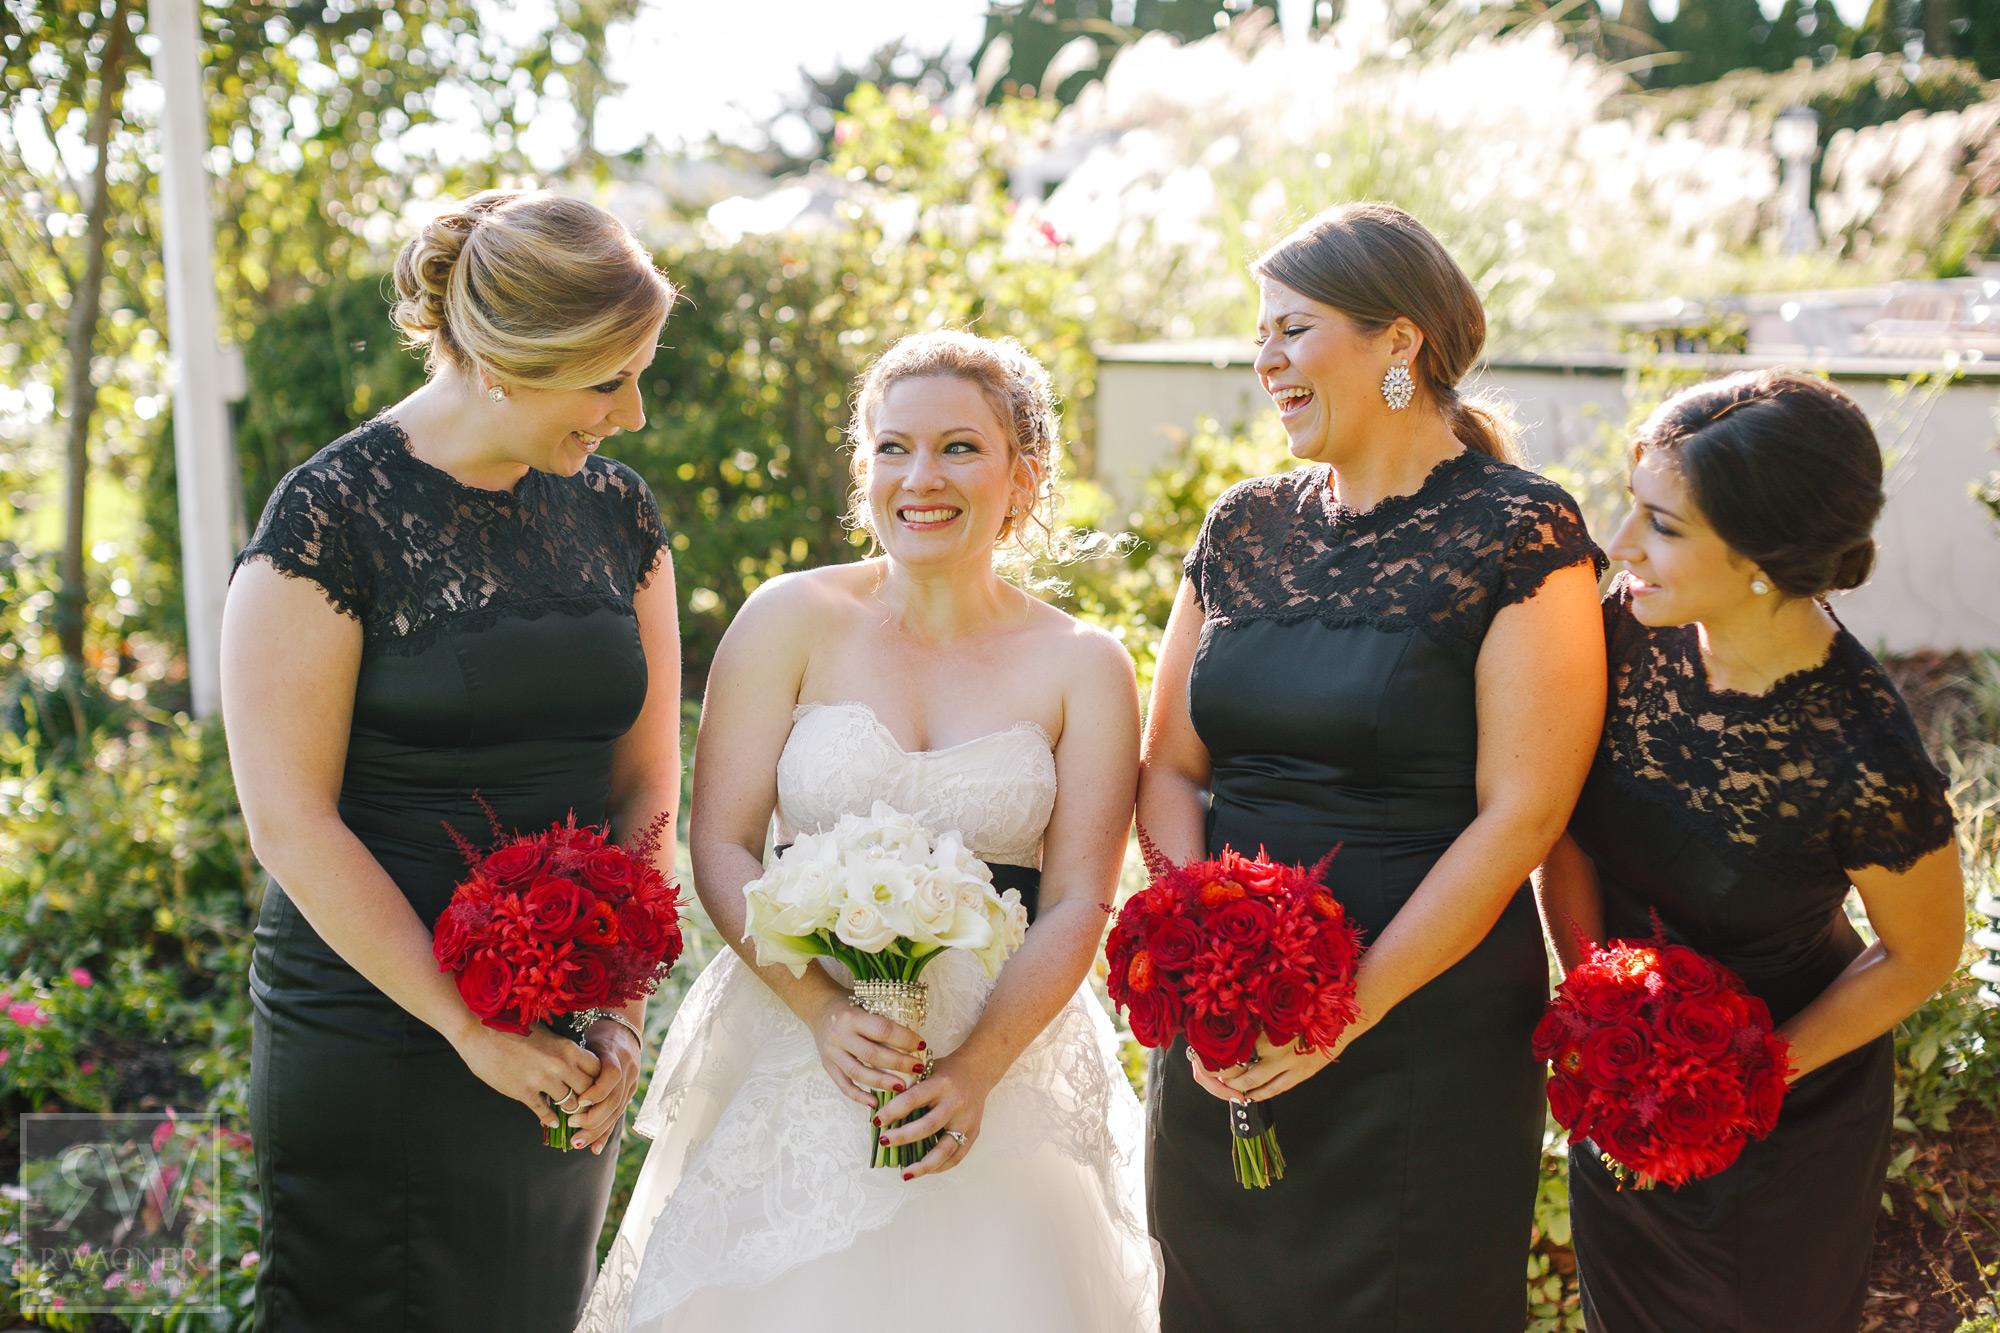 ceci_new_york_luxury_wedding_invitations_couture_red_black_white_real_wedding_dramatic_inn_at_longshore_v286_12.jpg